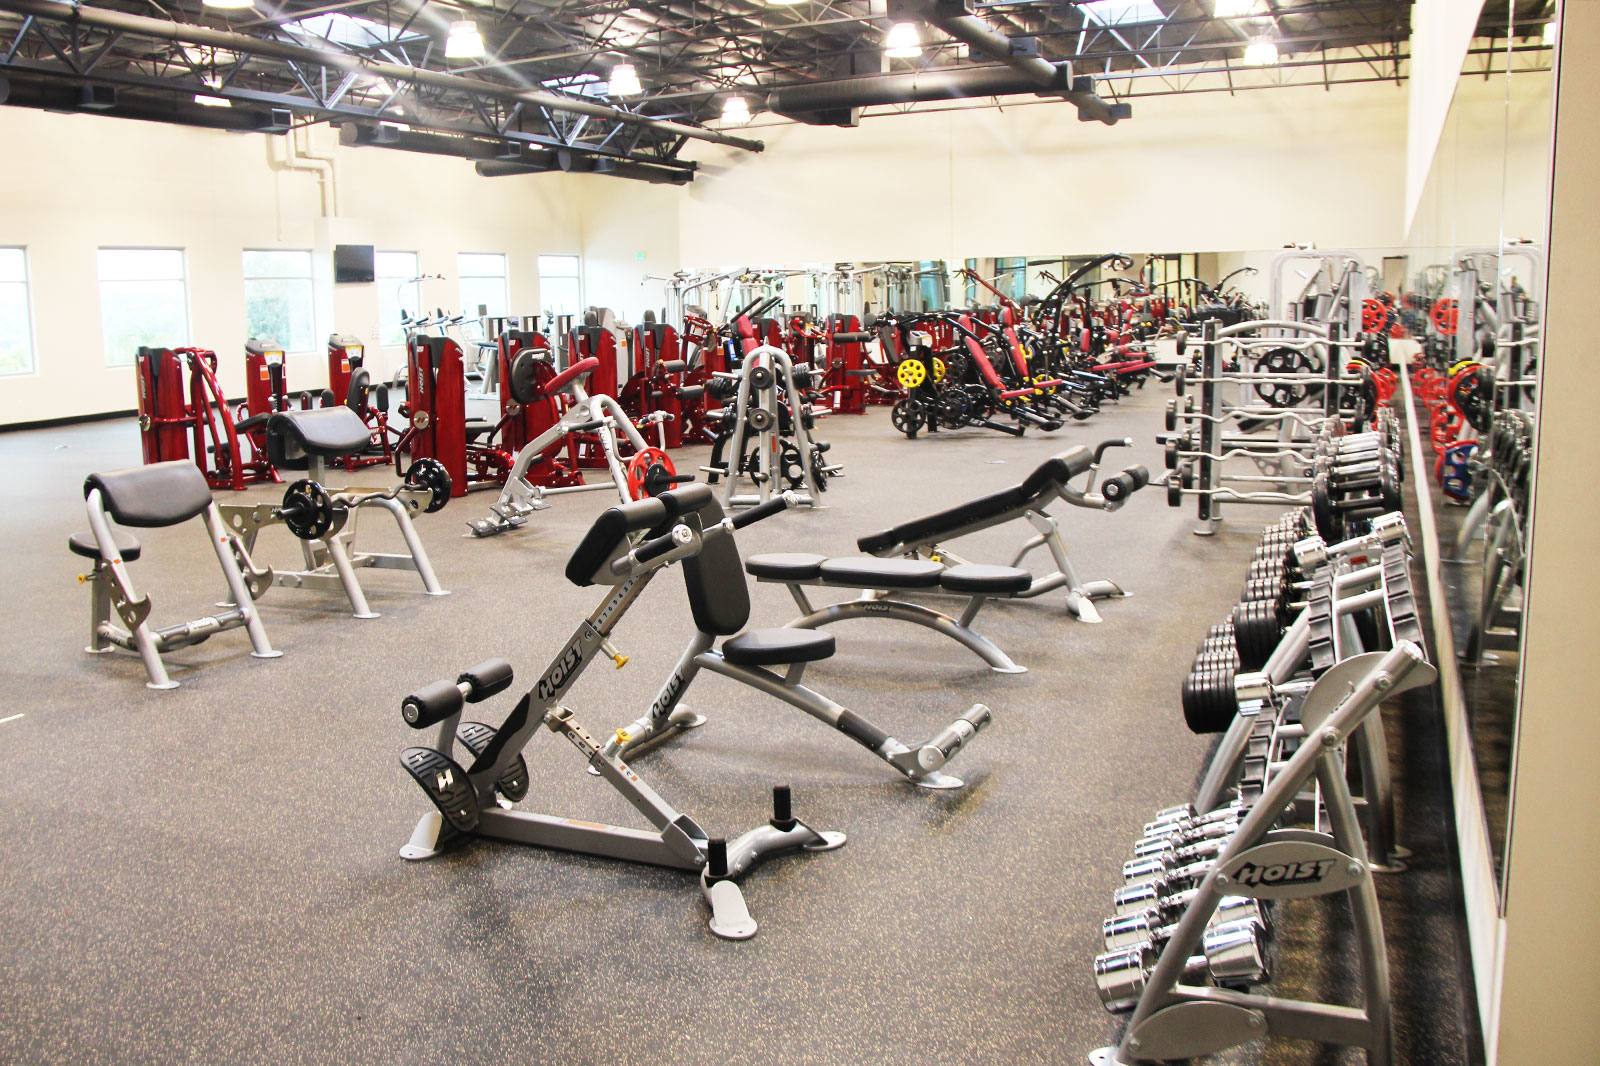 Hoist Fitness Systems